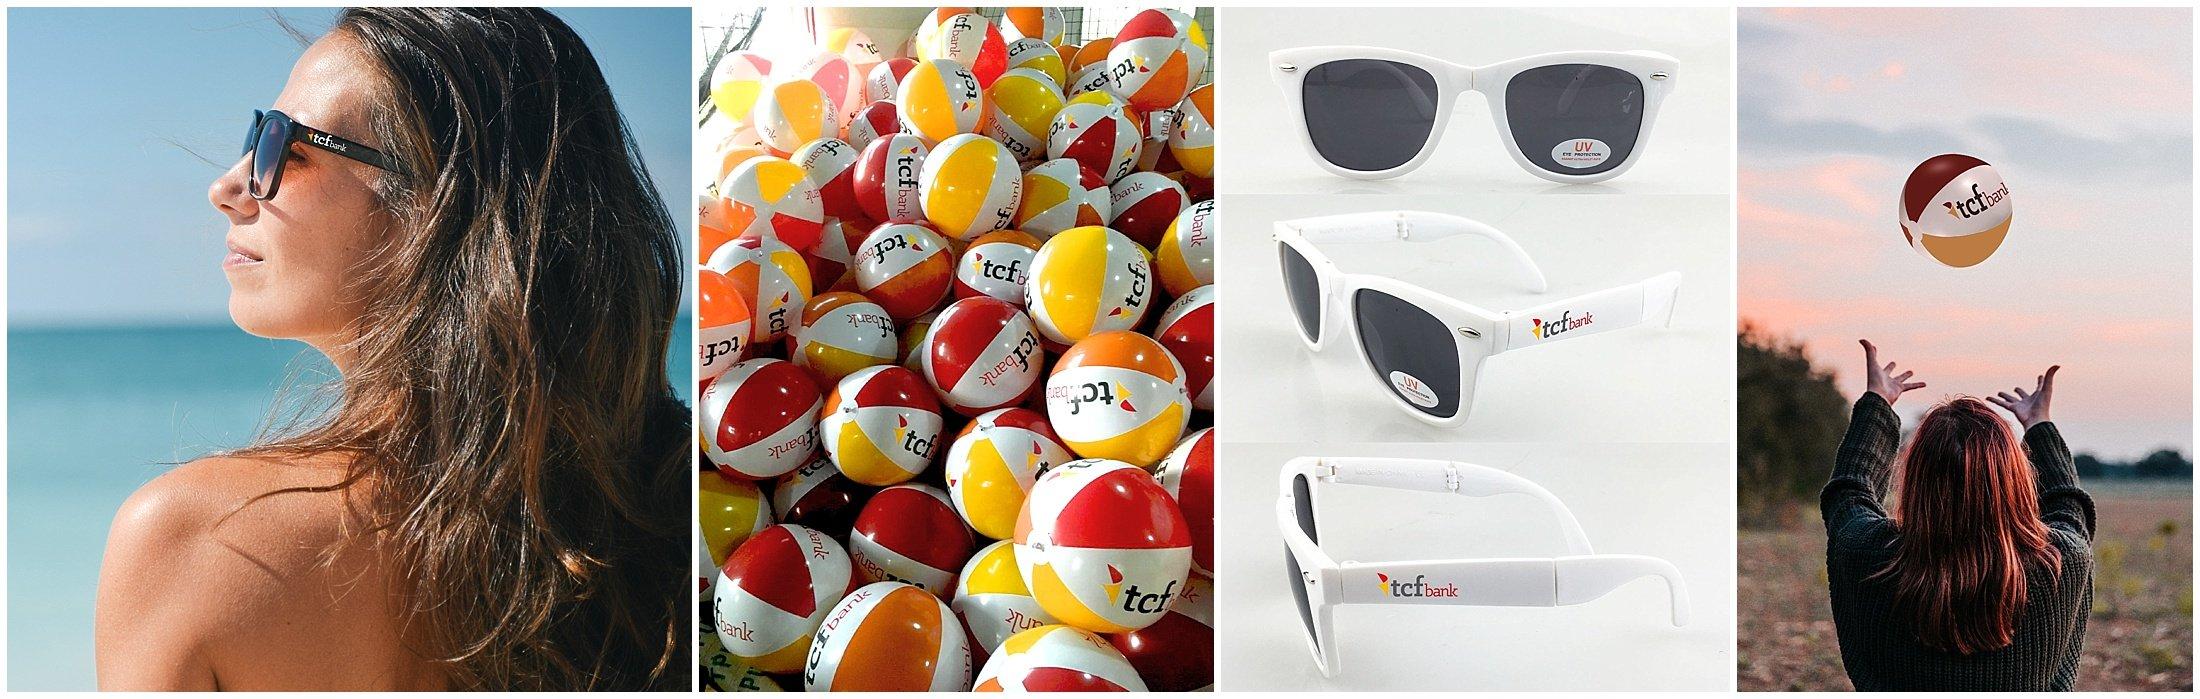 Custom sunglasses, lip balm, and beach balls for TCF's summer employee appreciation event